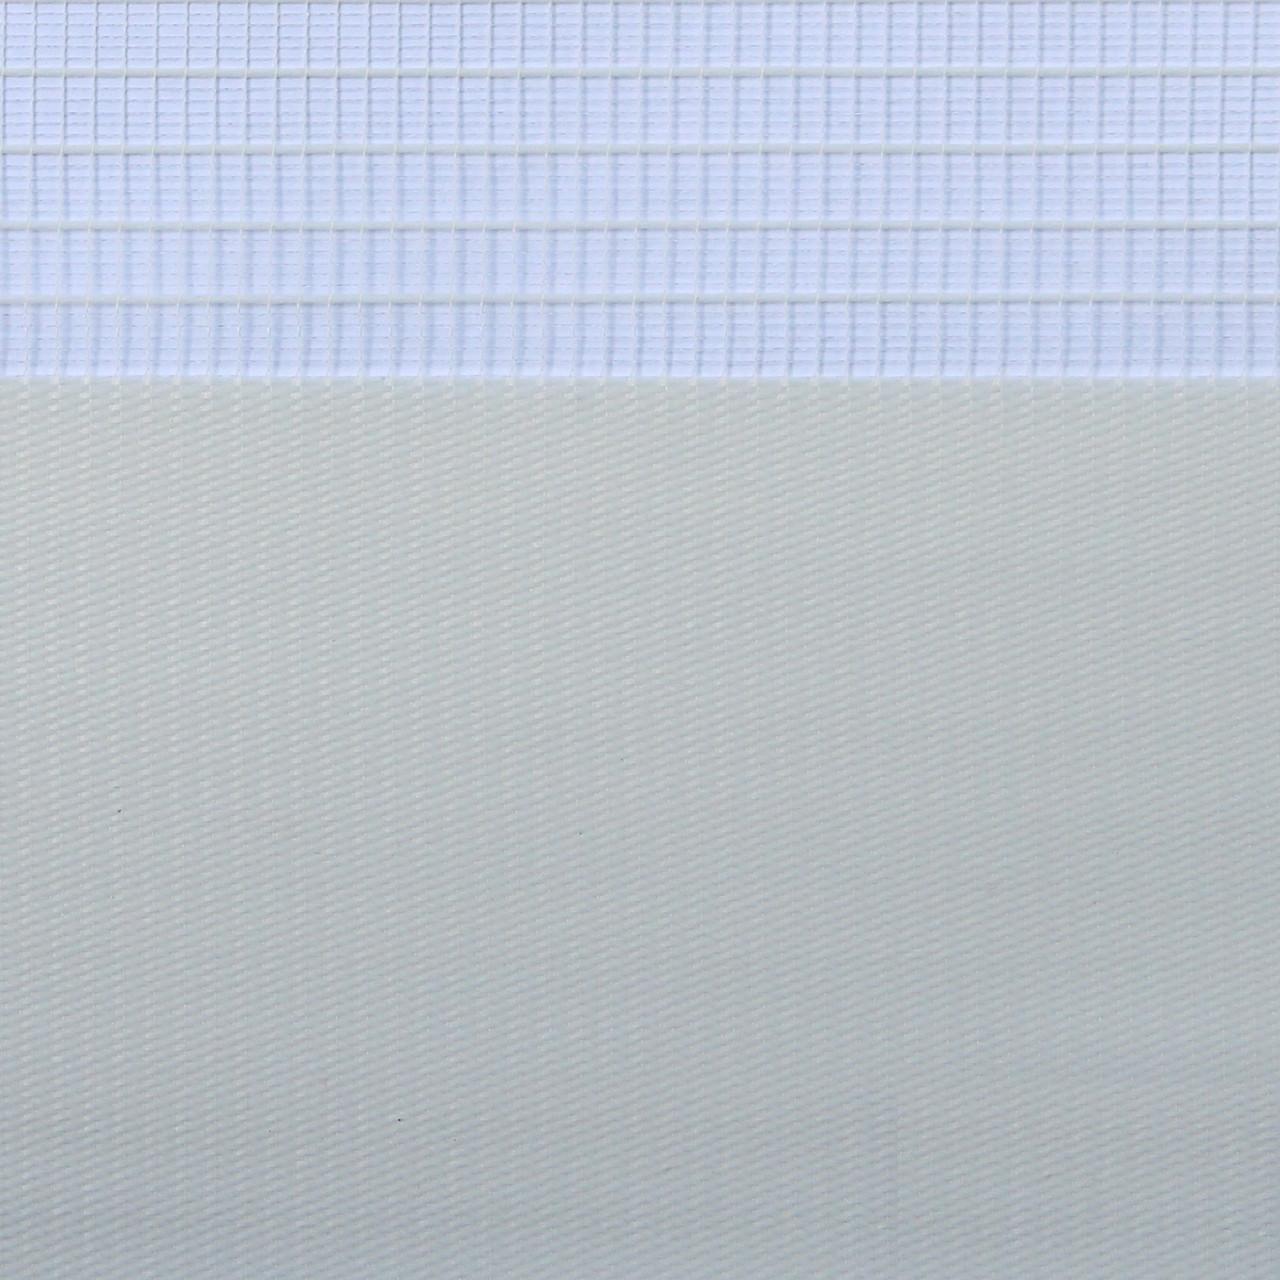 Готовые рулонные шторы Ткань ВН DN-213 Молочный 525*1300